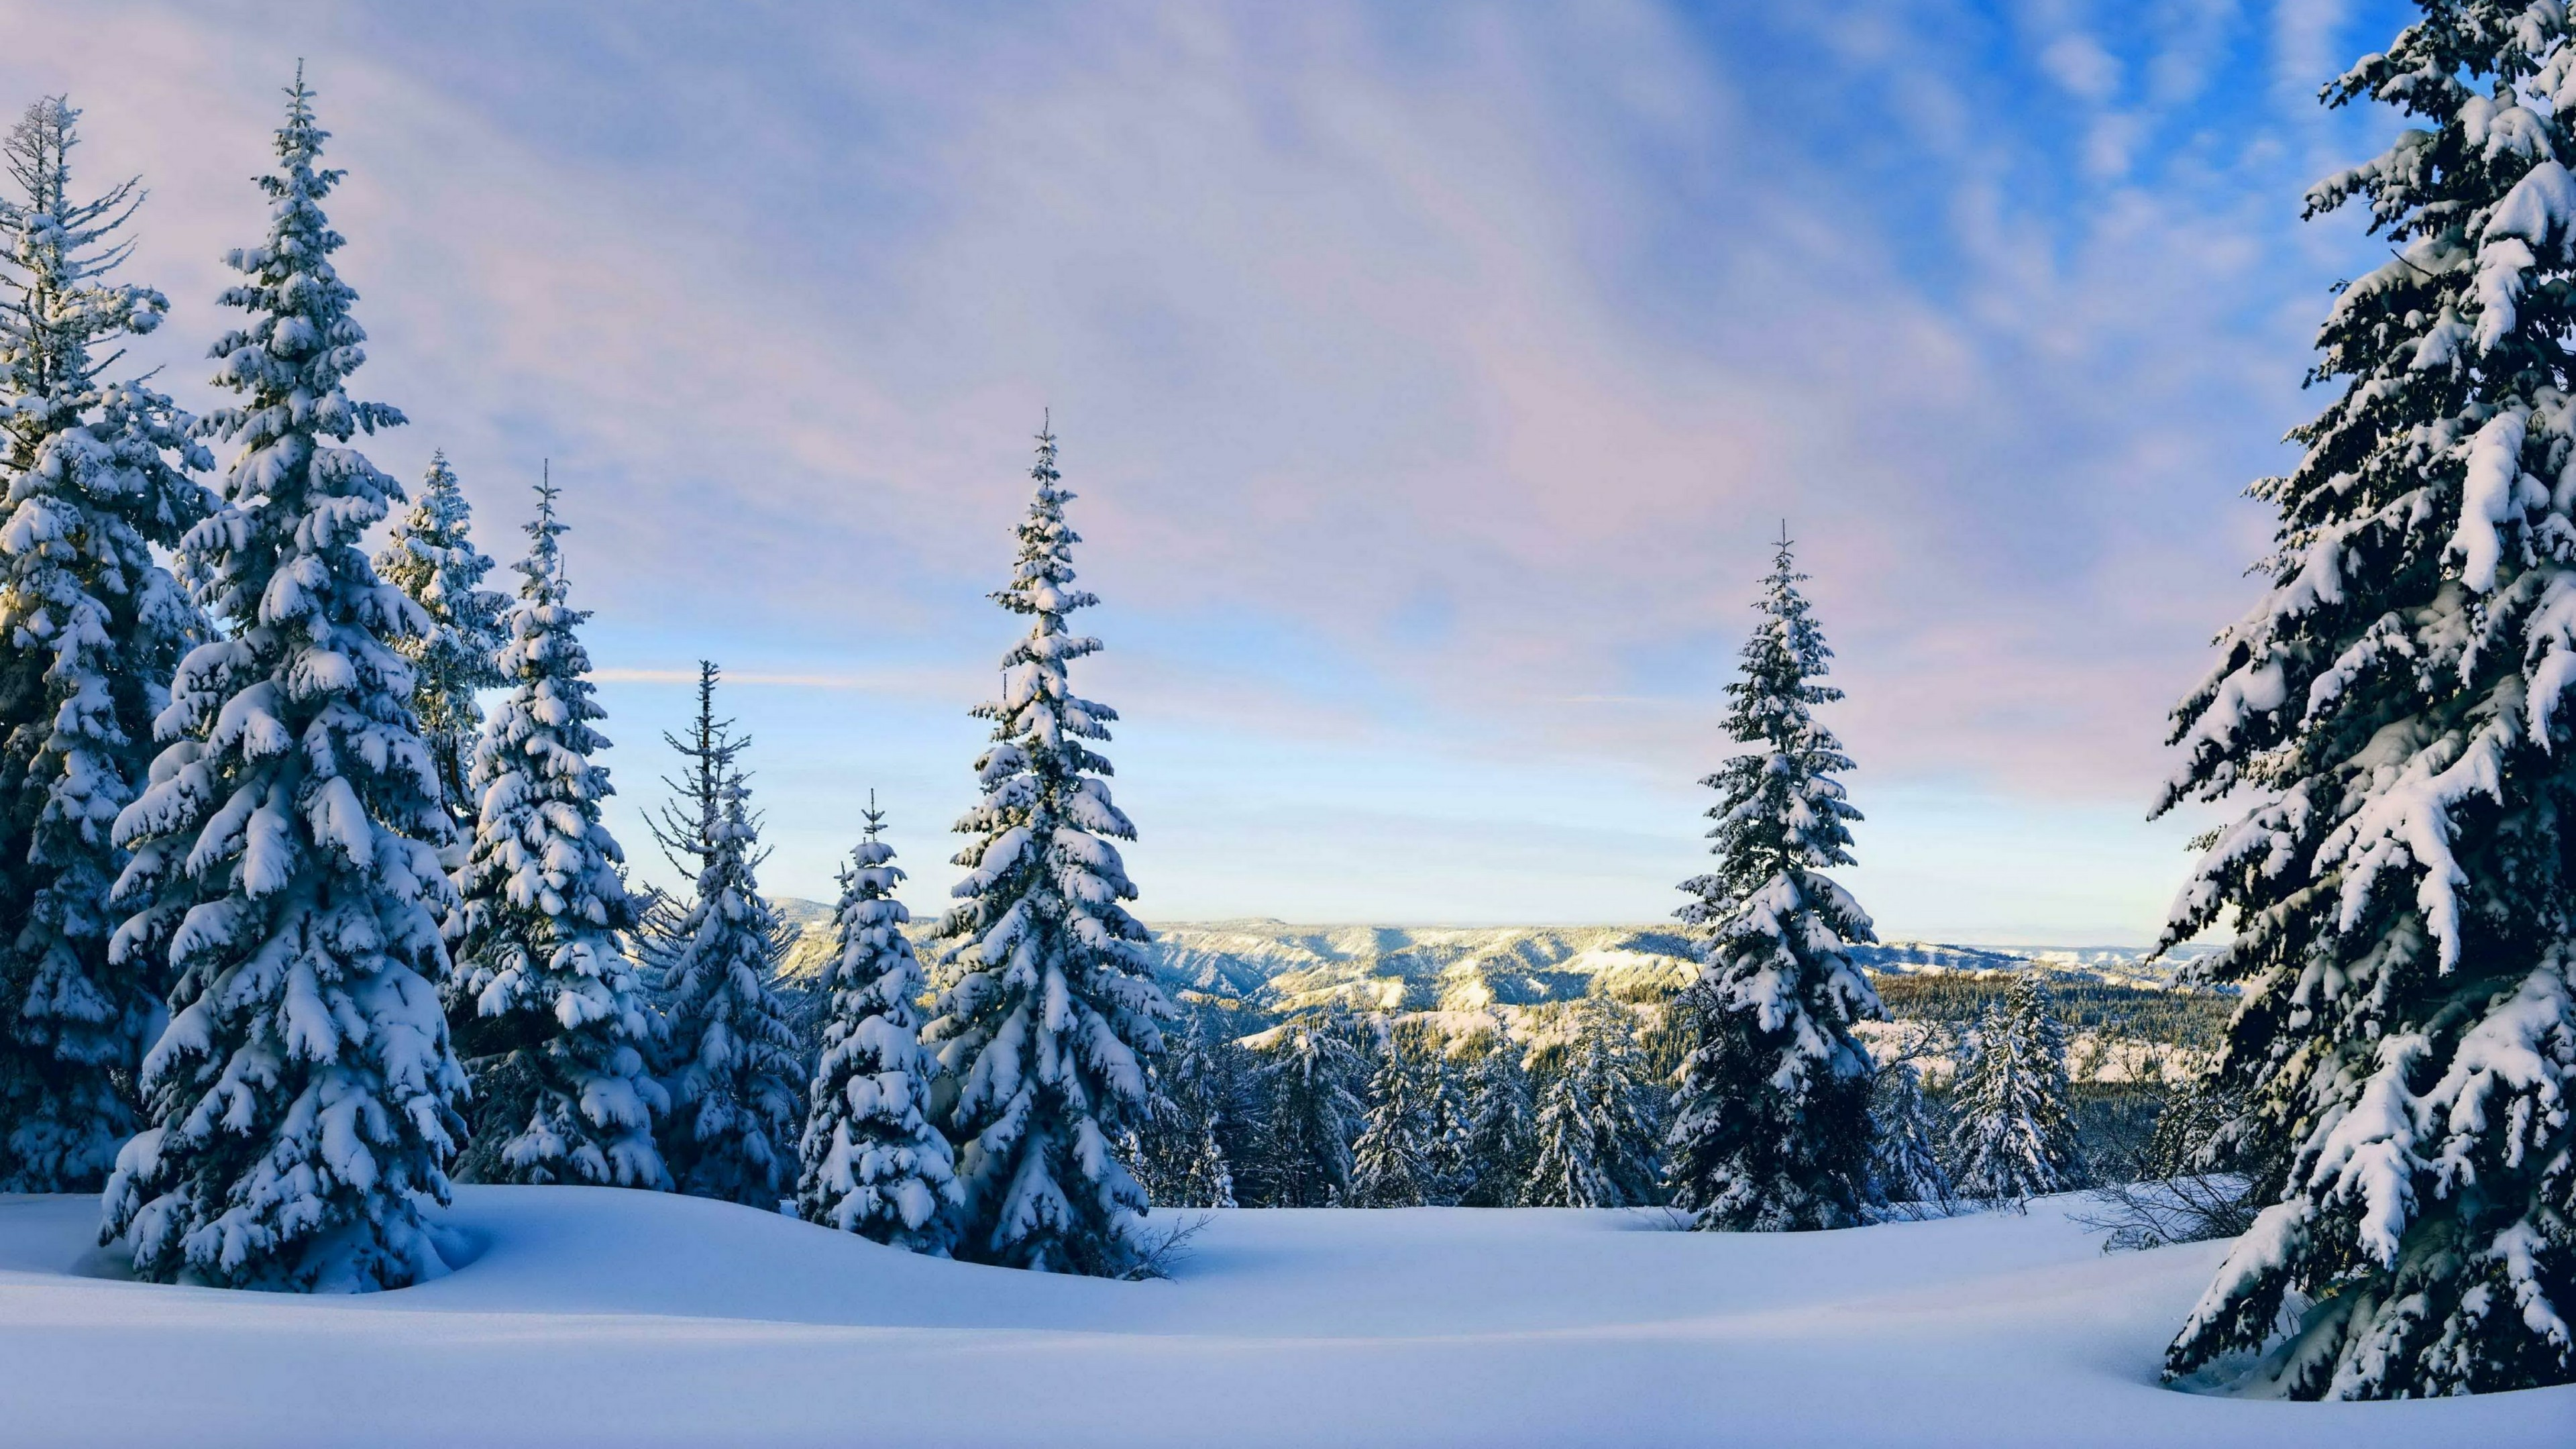 Snowy pine trees wallpaper